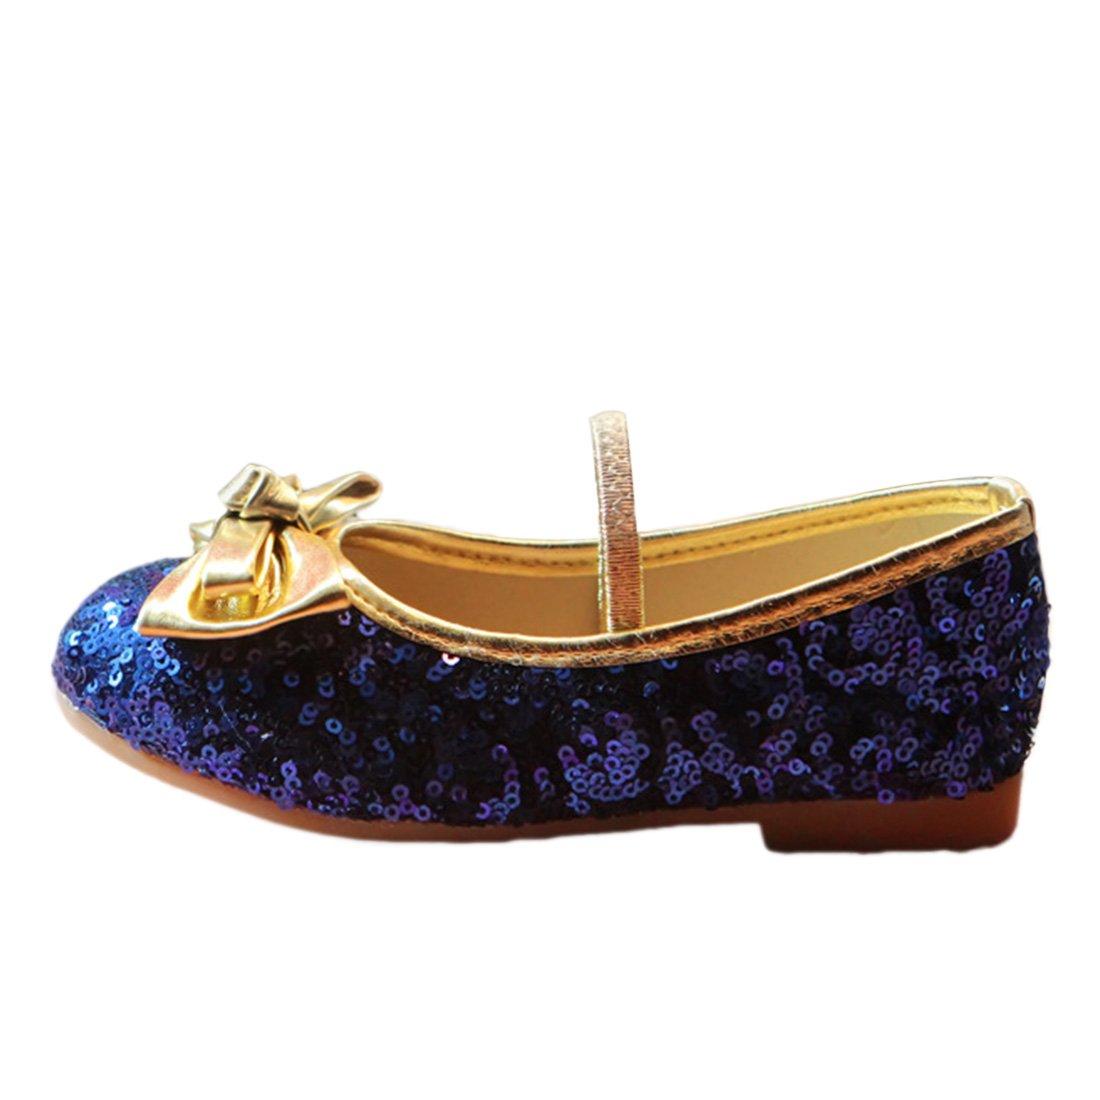 YIBLBOX Toddler Kids Girls Cute Ballet Flats Bowknot Mary Janes Wedding For Party Princess Dress Shoes